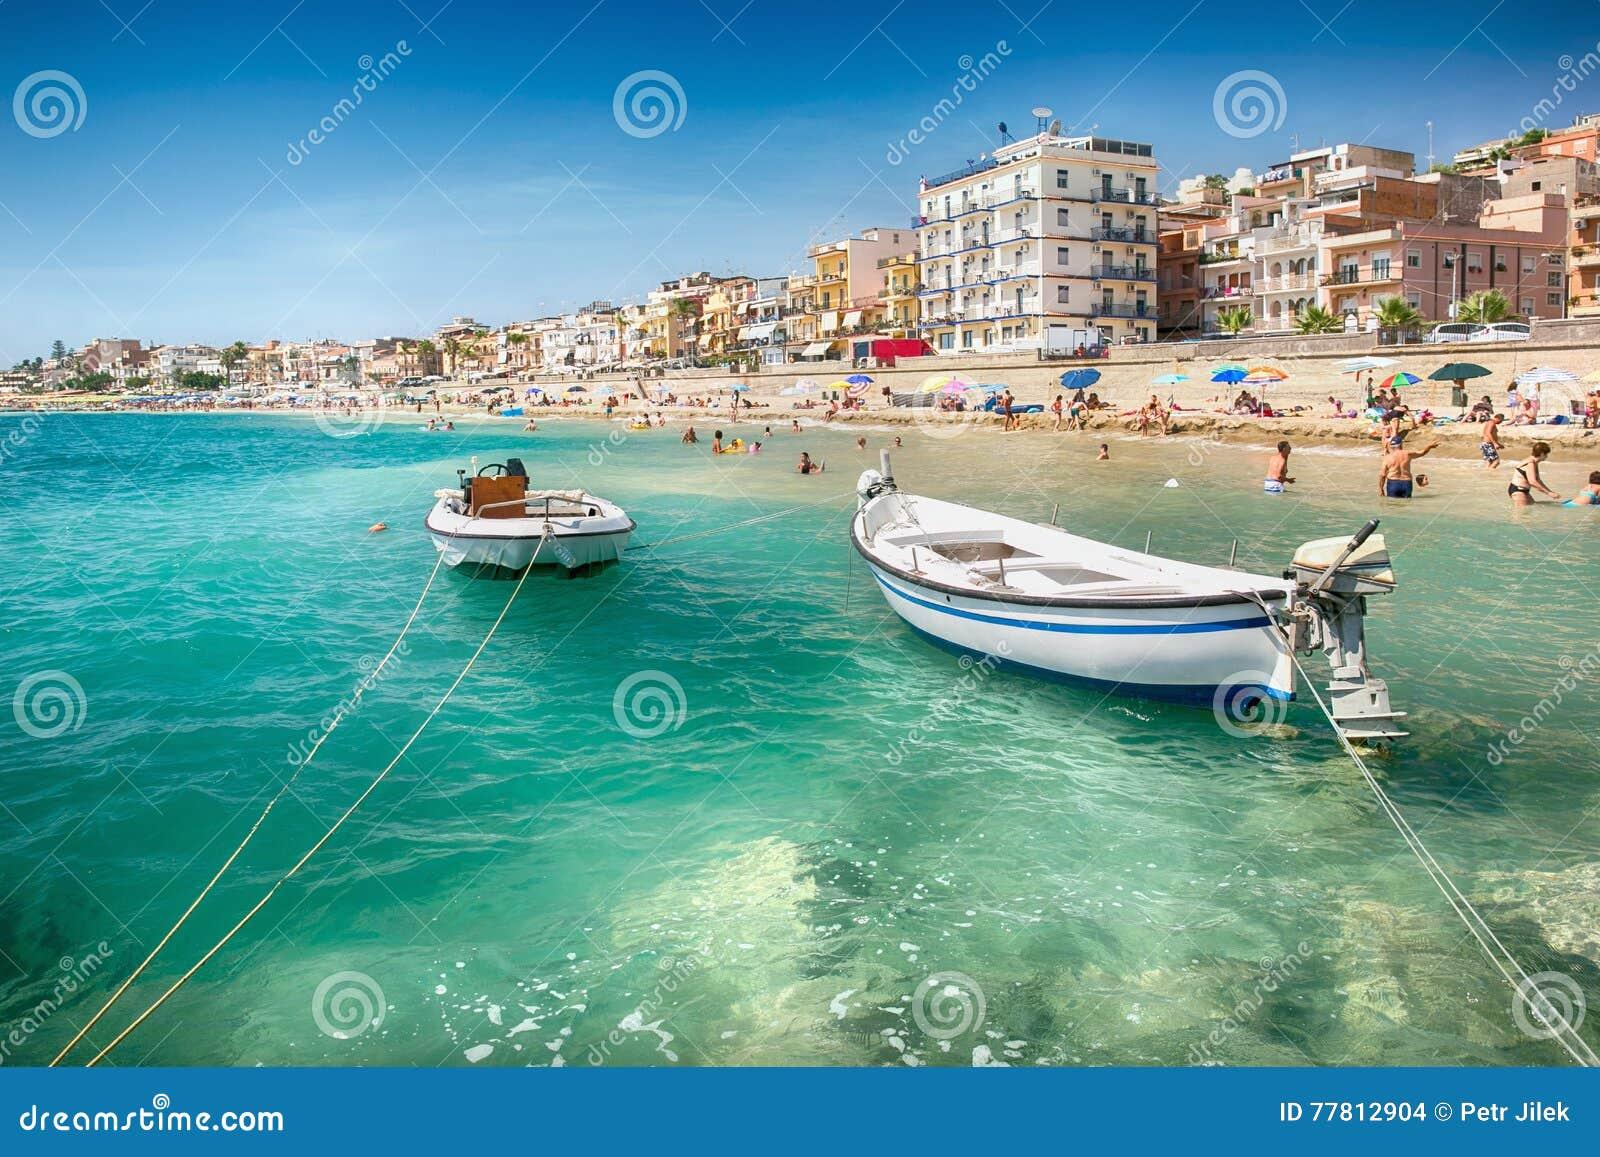 Praia em Giardini Naxos, Sicília